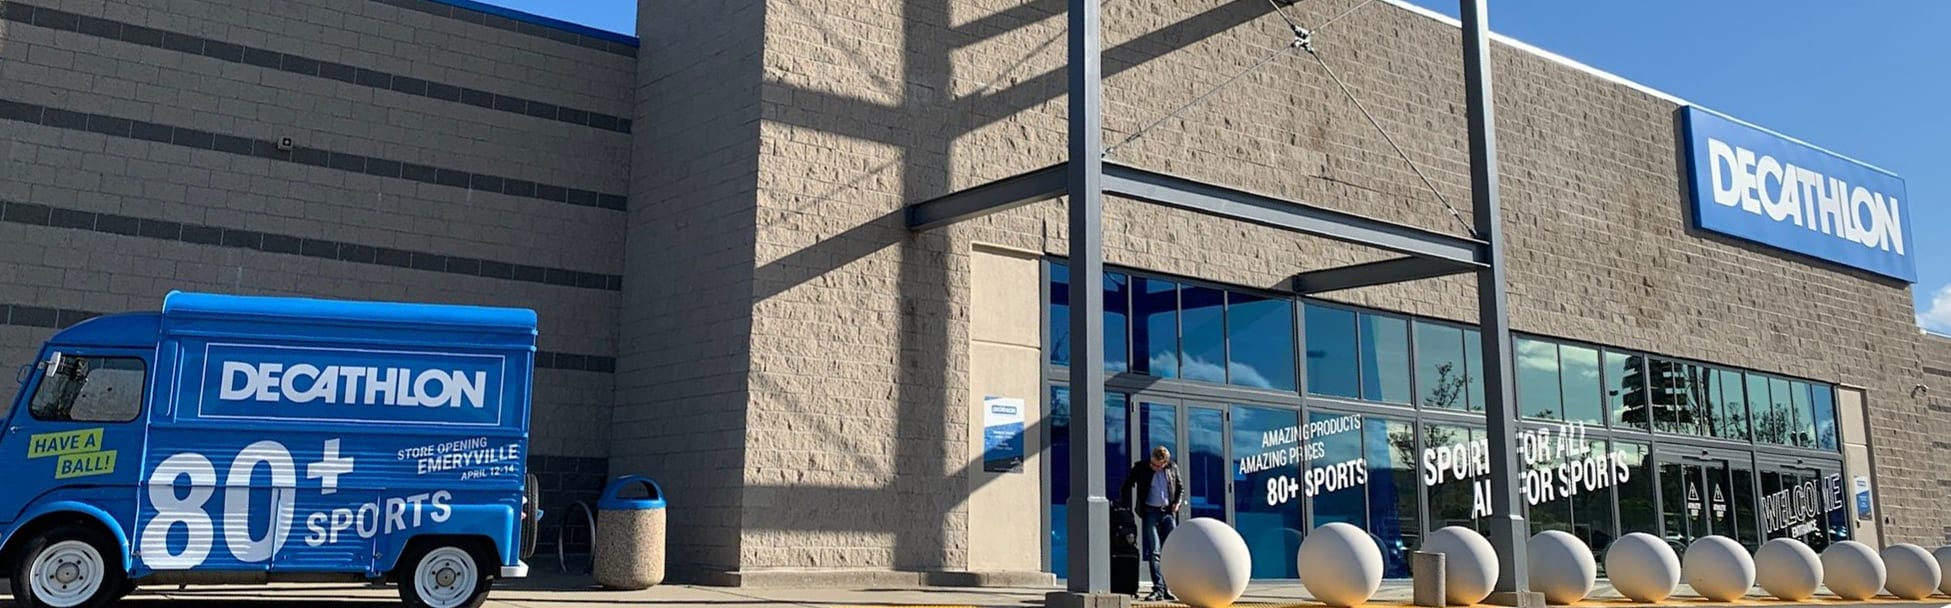 decathlon storefront